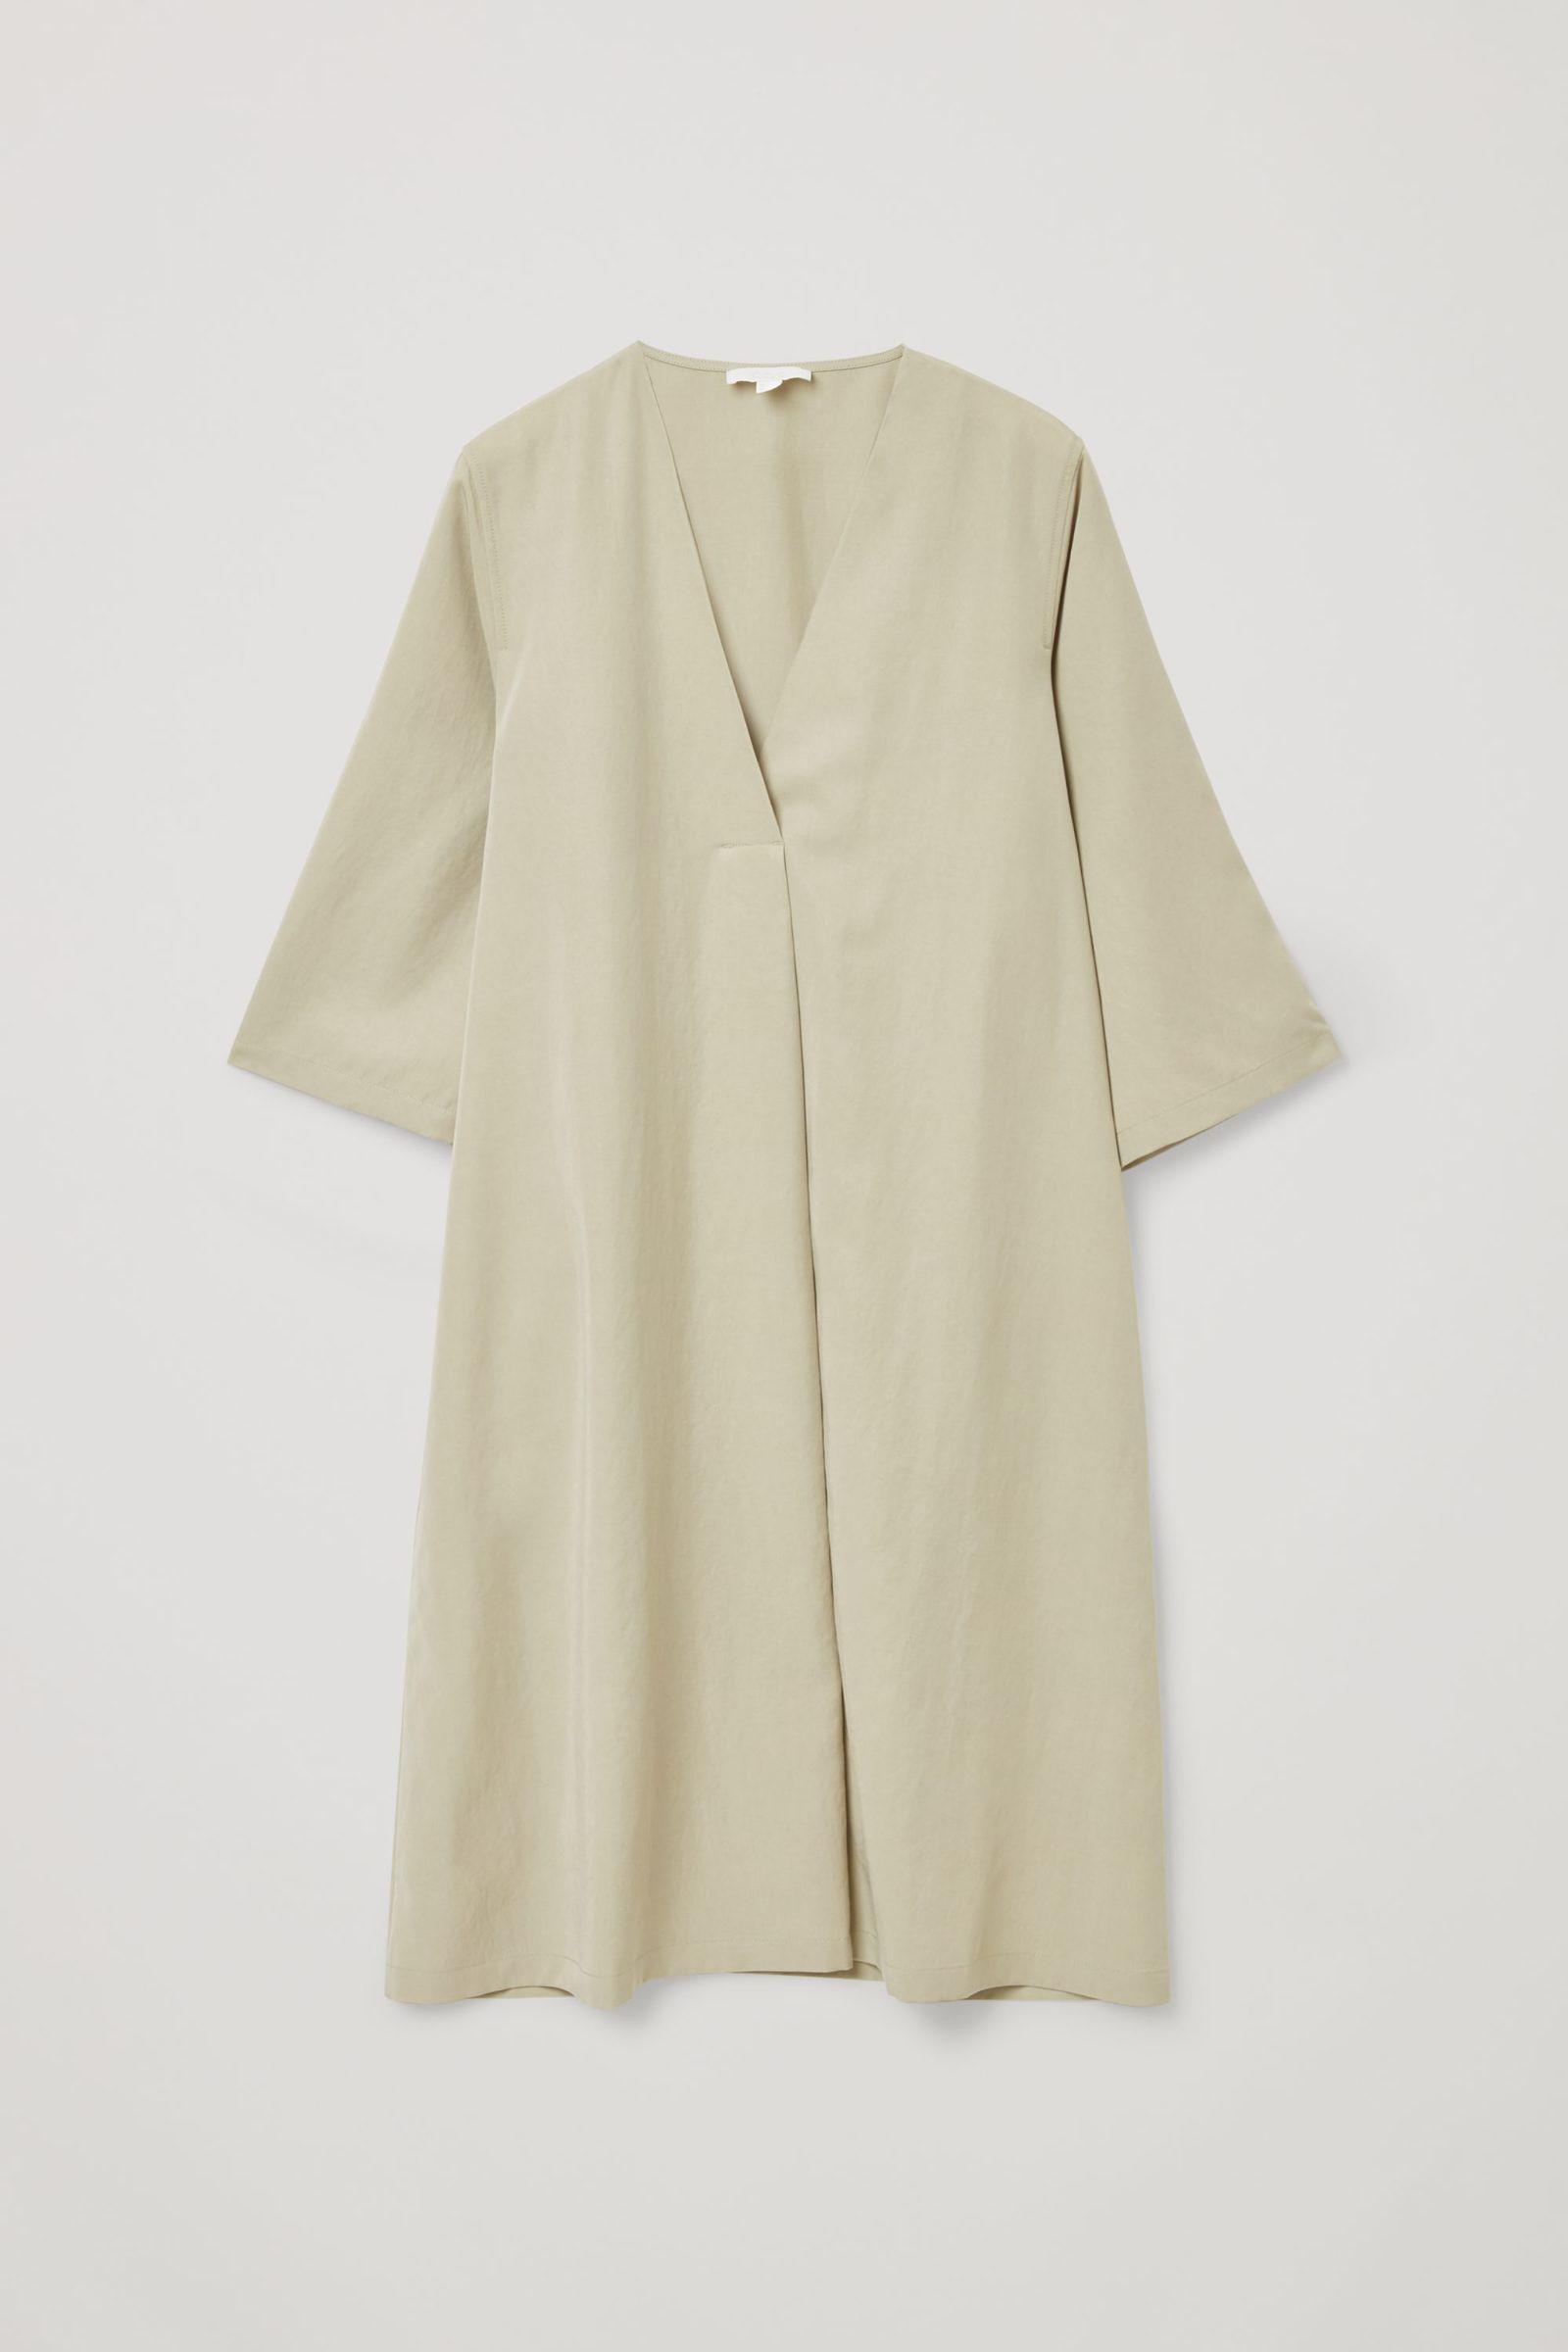 COS 브이넥 튜닉 드레스의 그린컬러 Product입니다.